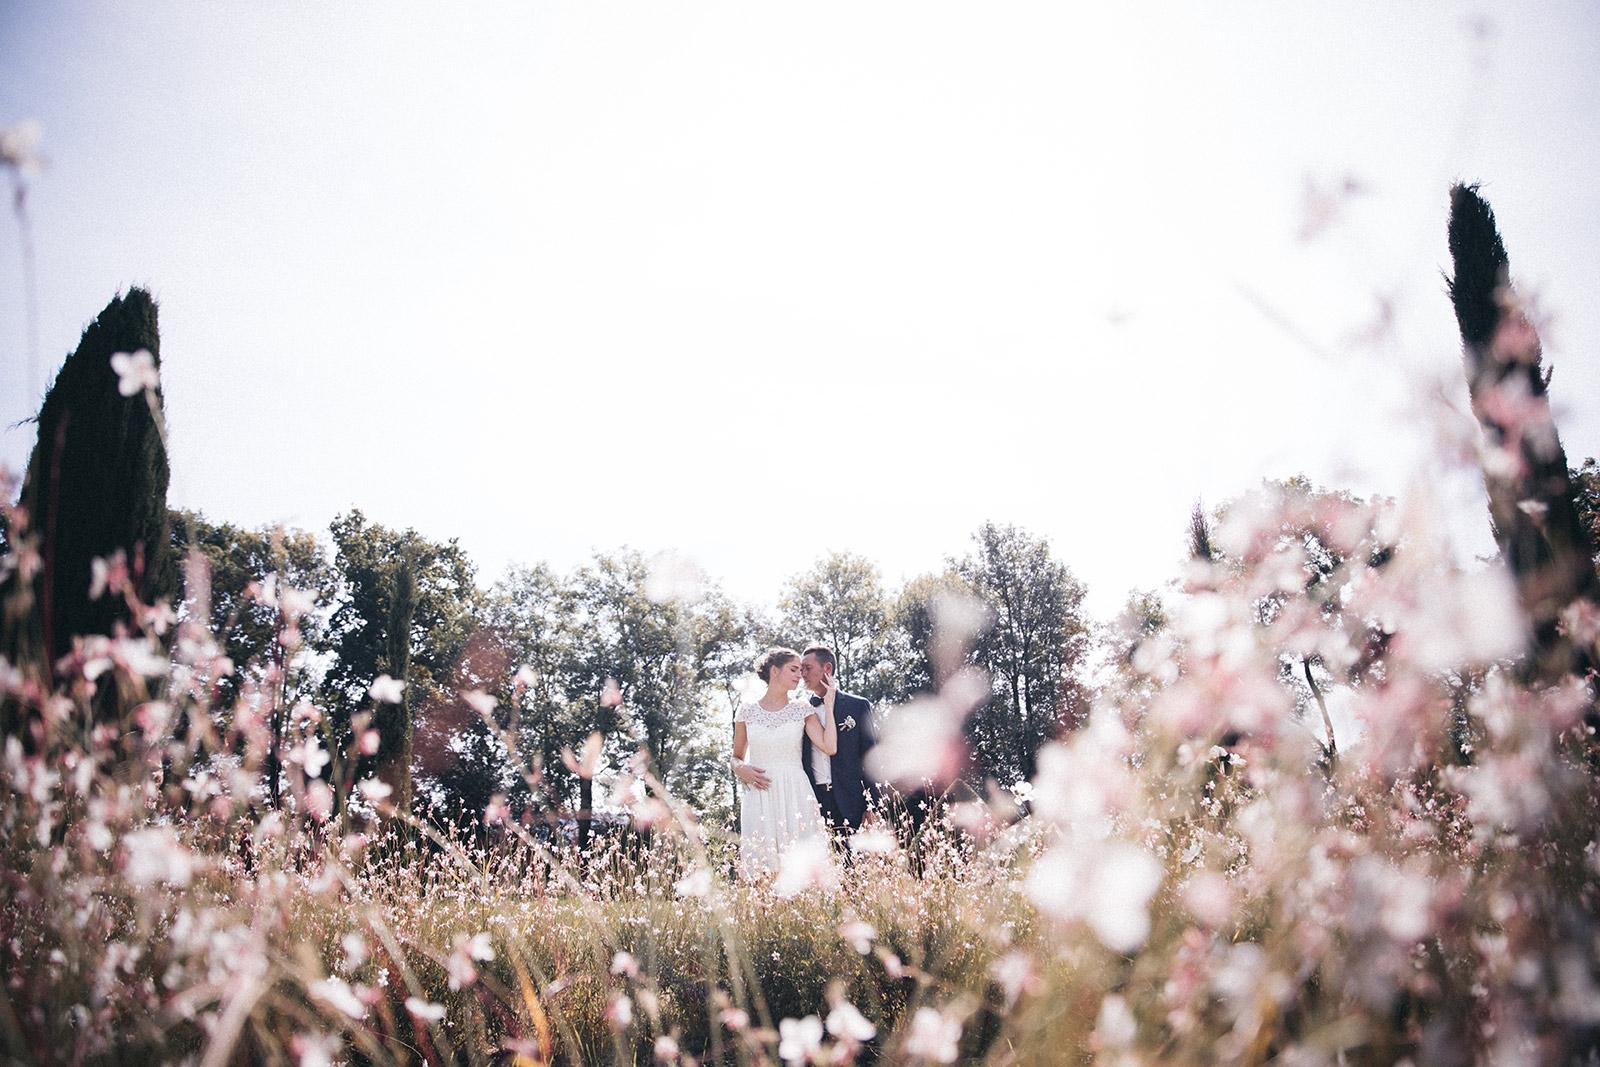 meilleurs avis photographe de mariage Chamalières . Photographe de mariage garden Mozac